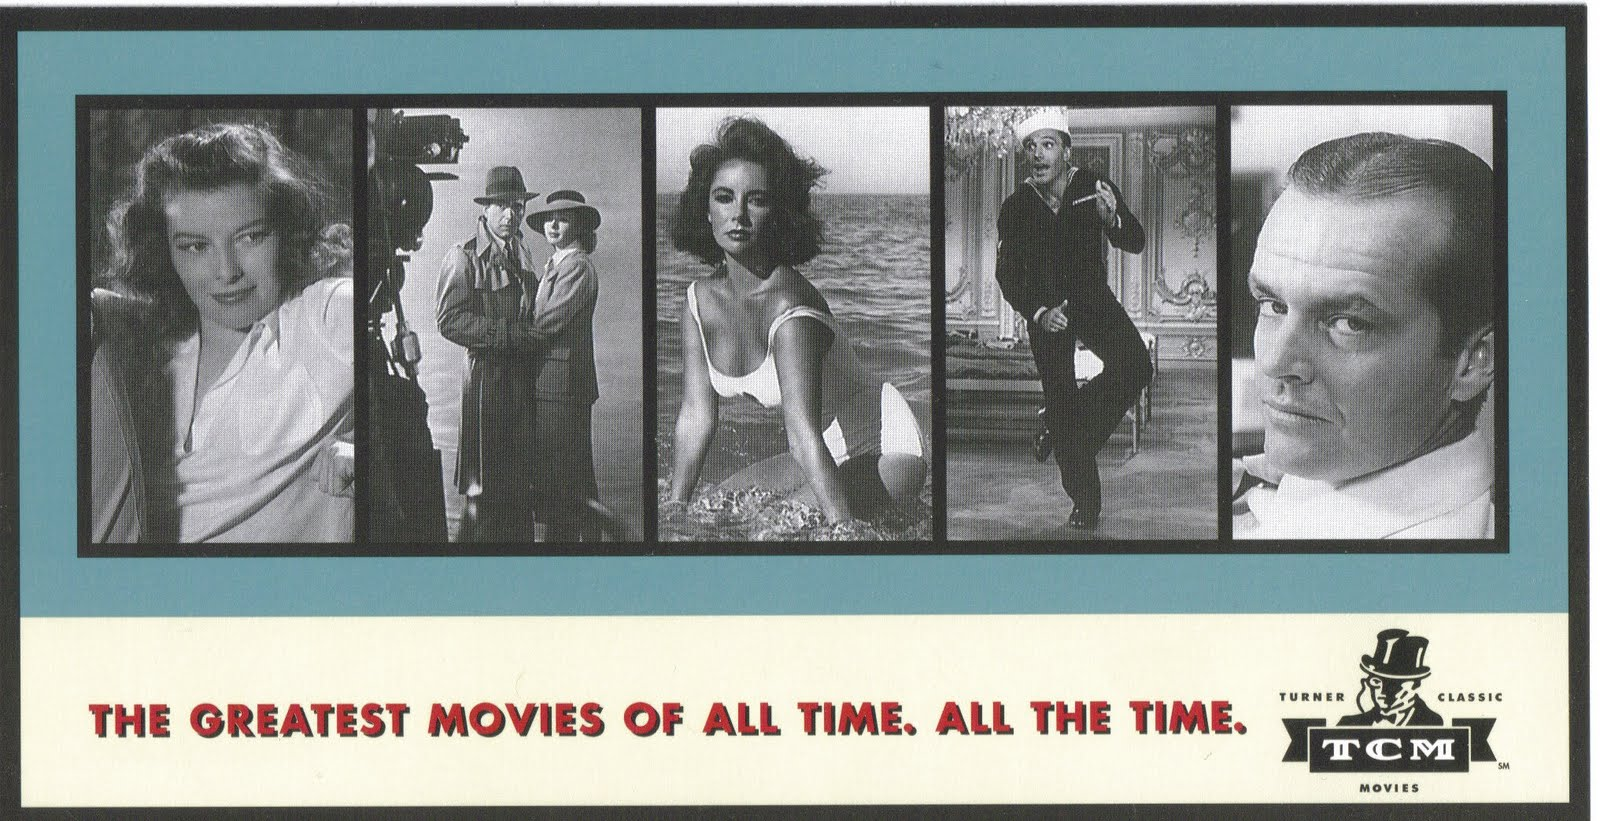 Turner Classic Movie Schedule